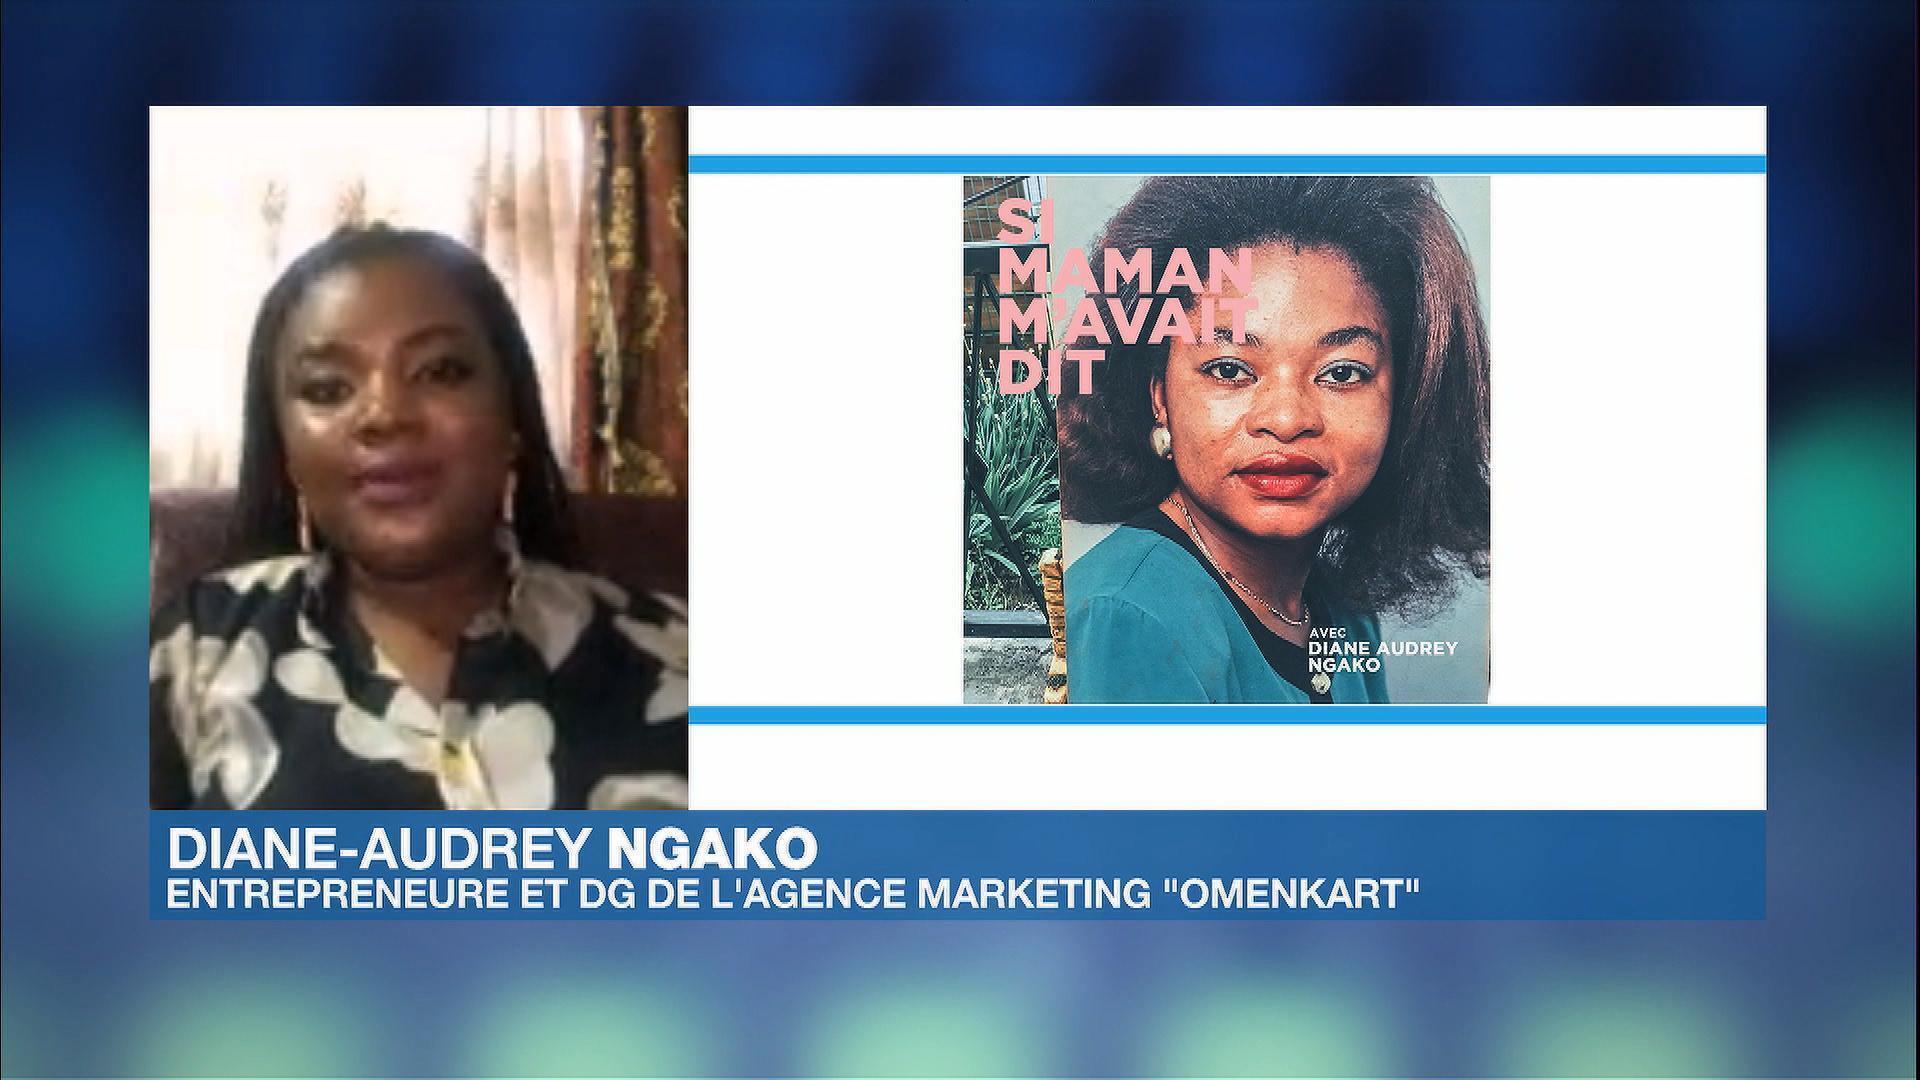 Diane-Audrey Ngako dans Afrique Hebdo